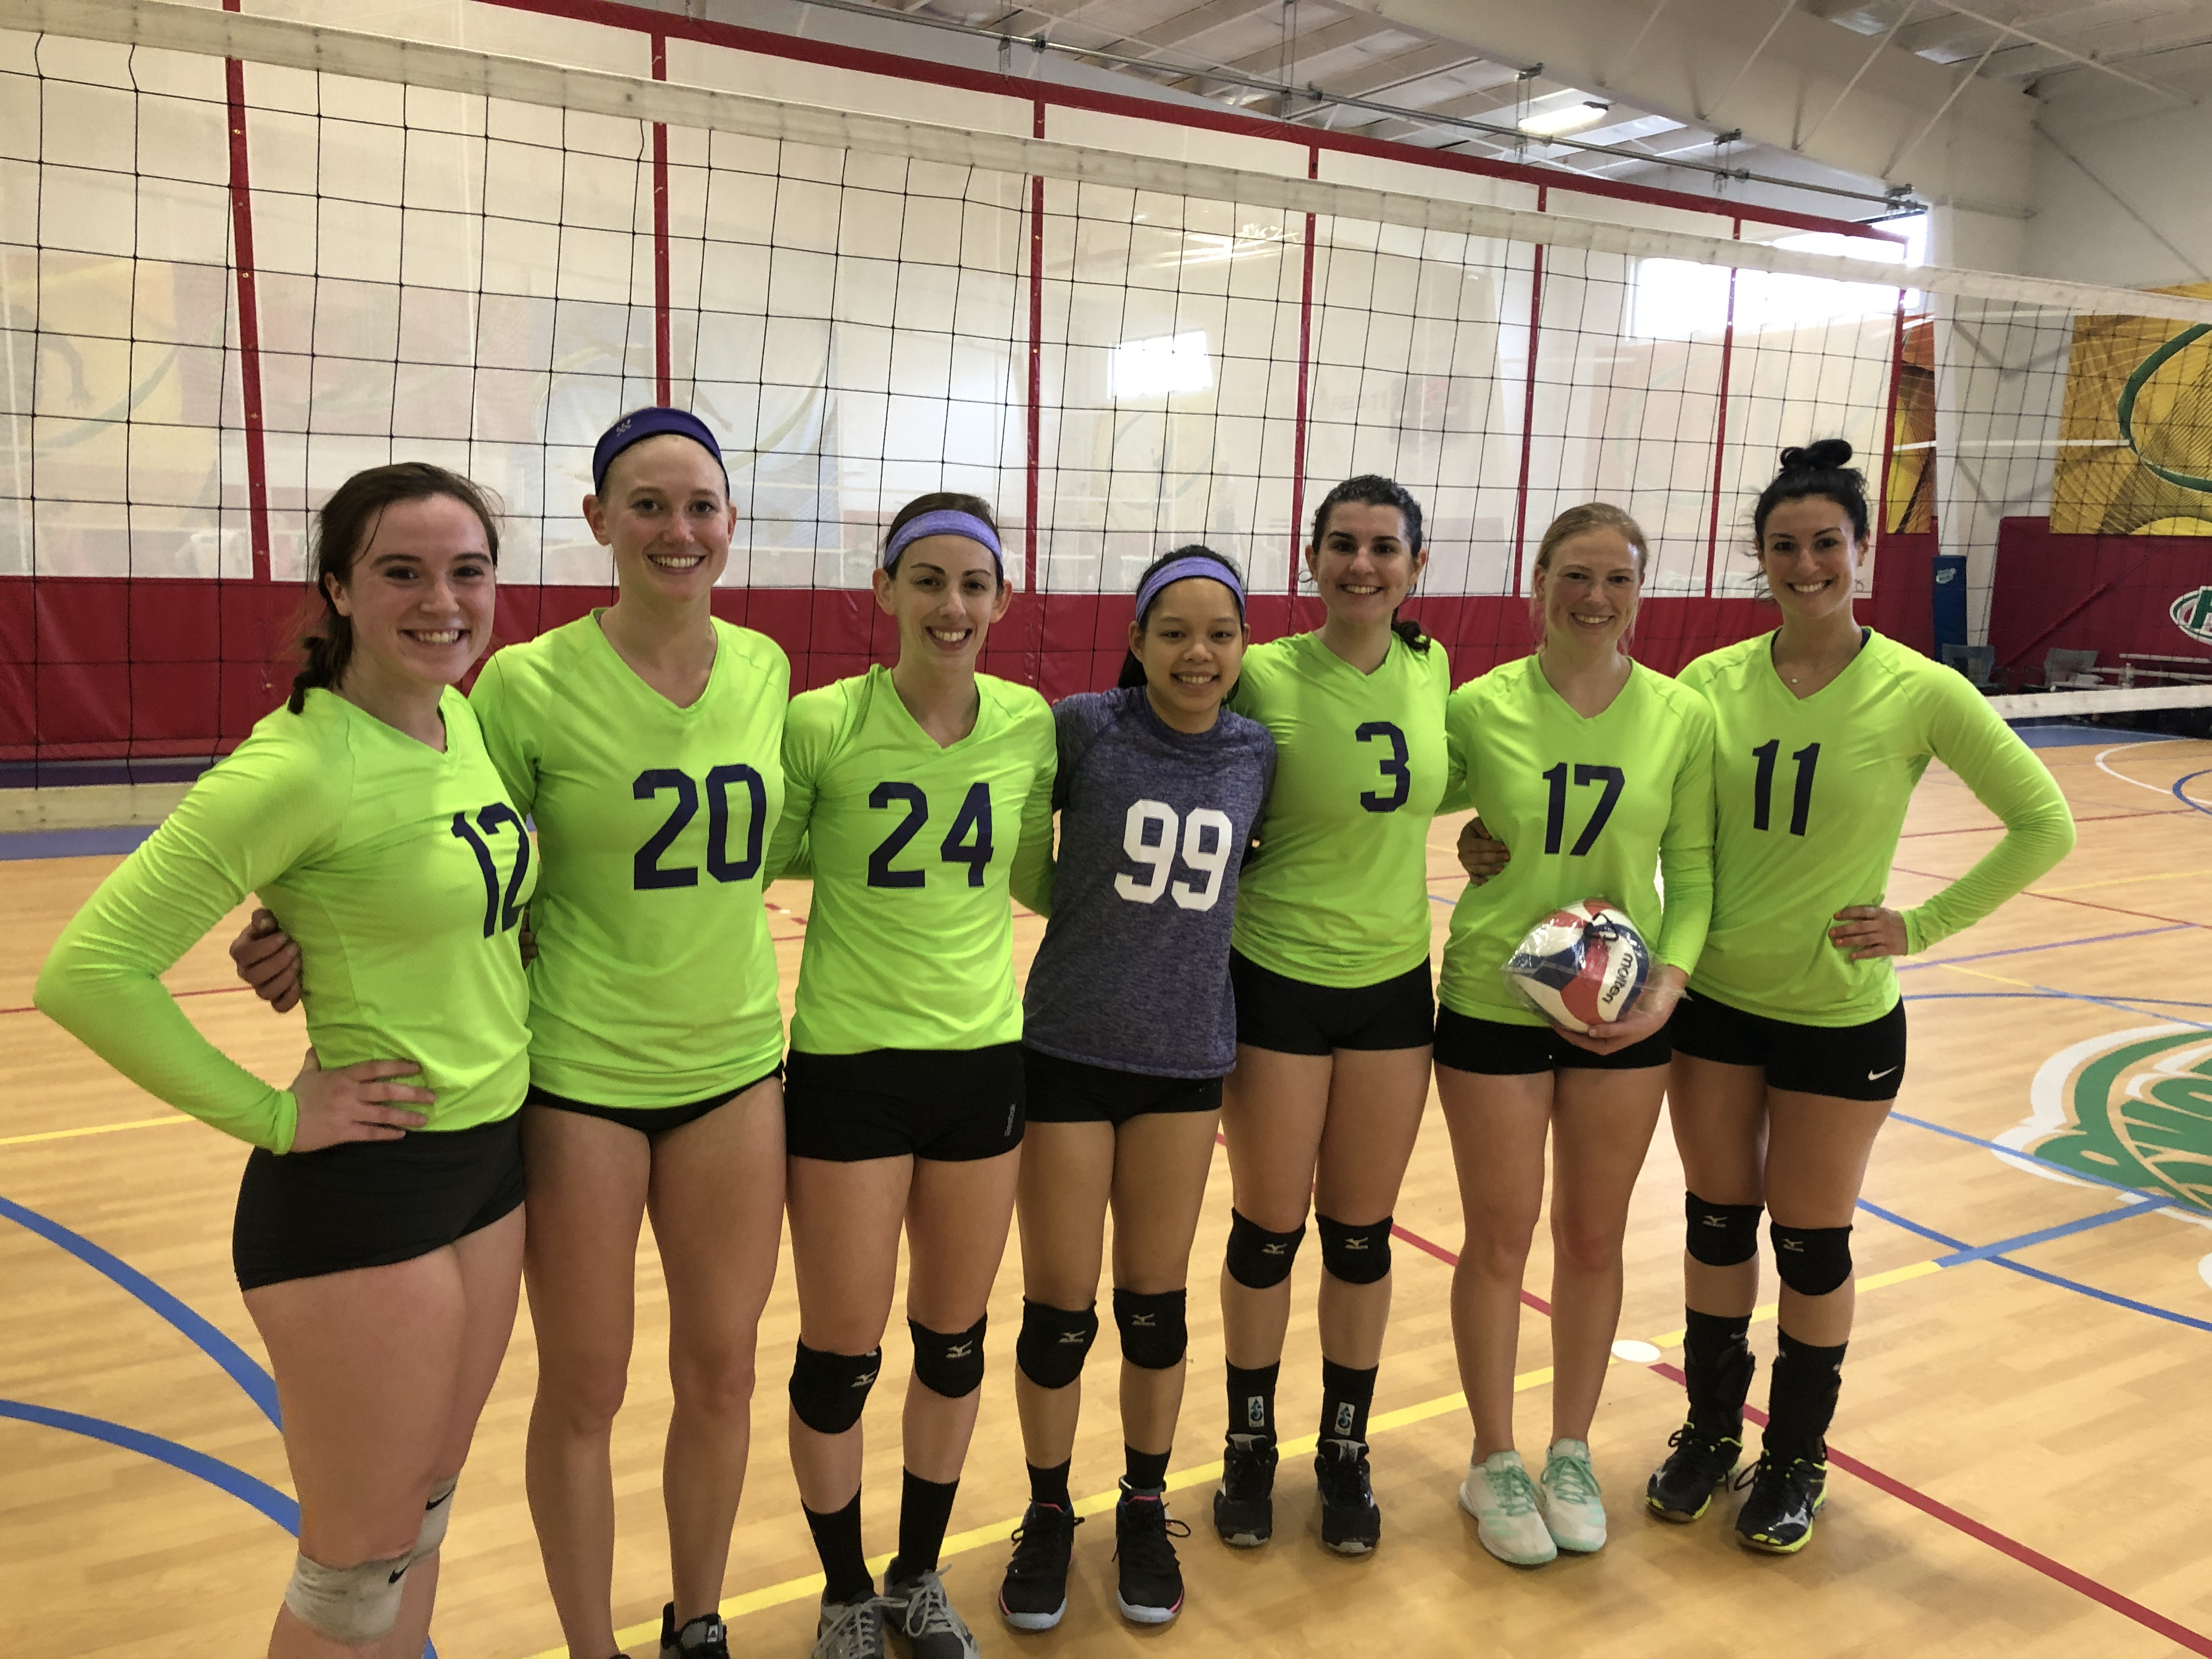 Awkward High 5s win the Women's B Regionals